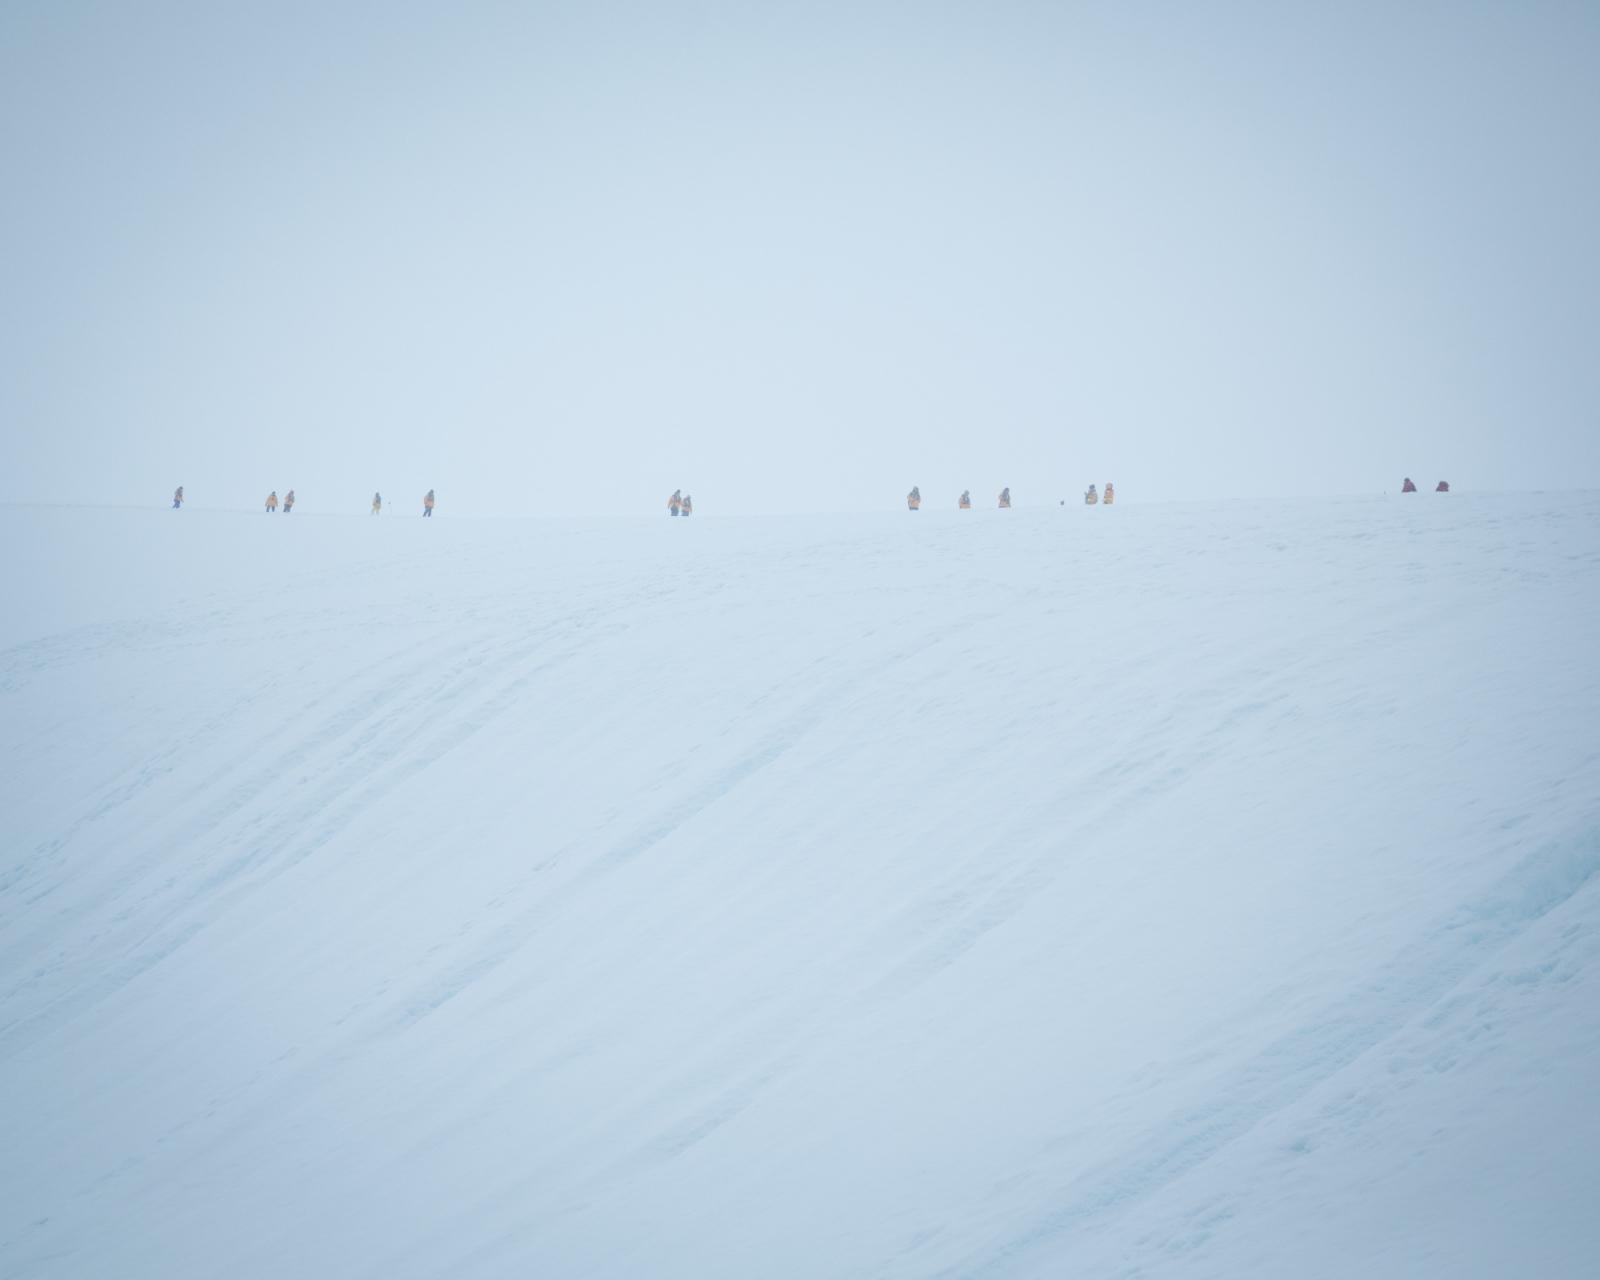 Art and Documentary Photography - Loading 0_Antarctica_UPLOAD_acaciajohnson_16.jpg